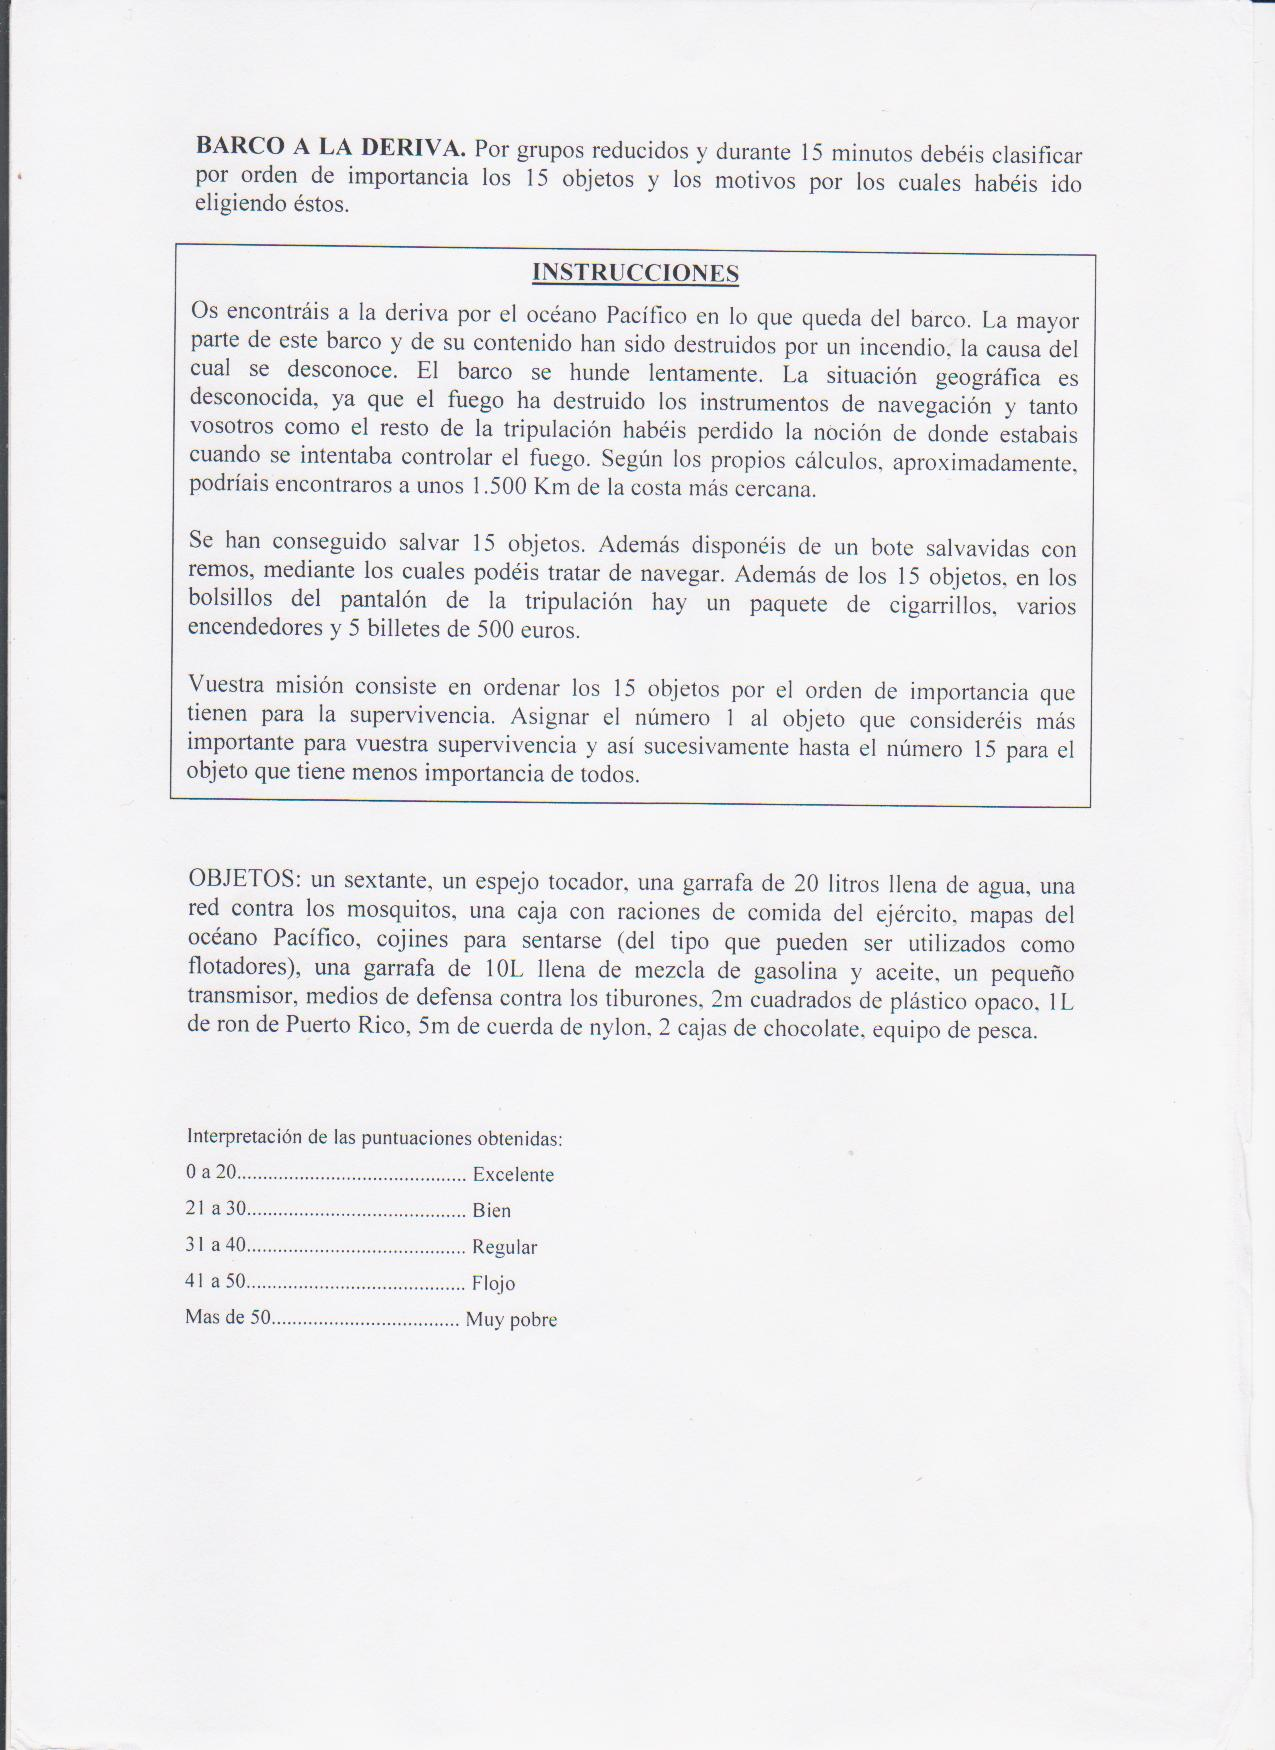 Dinamica Grupos Toma Decisiones Barco Deriva